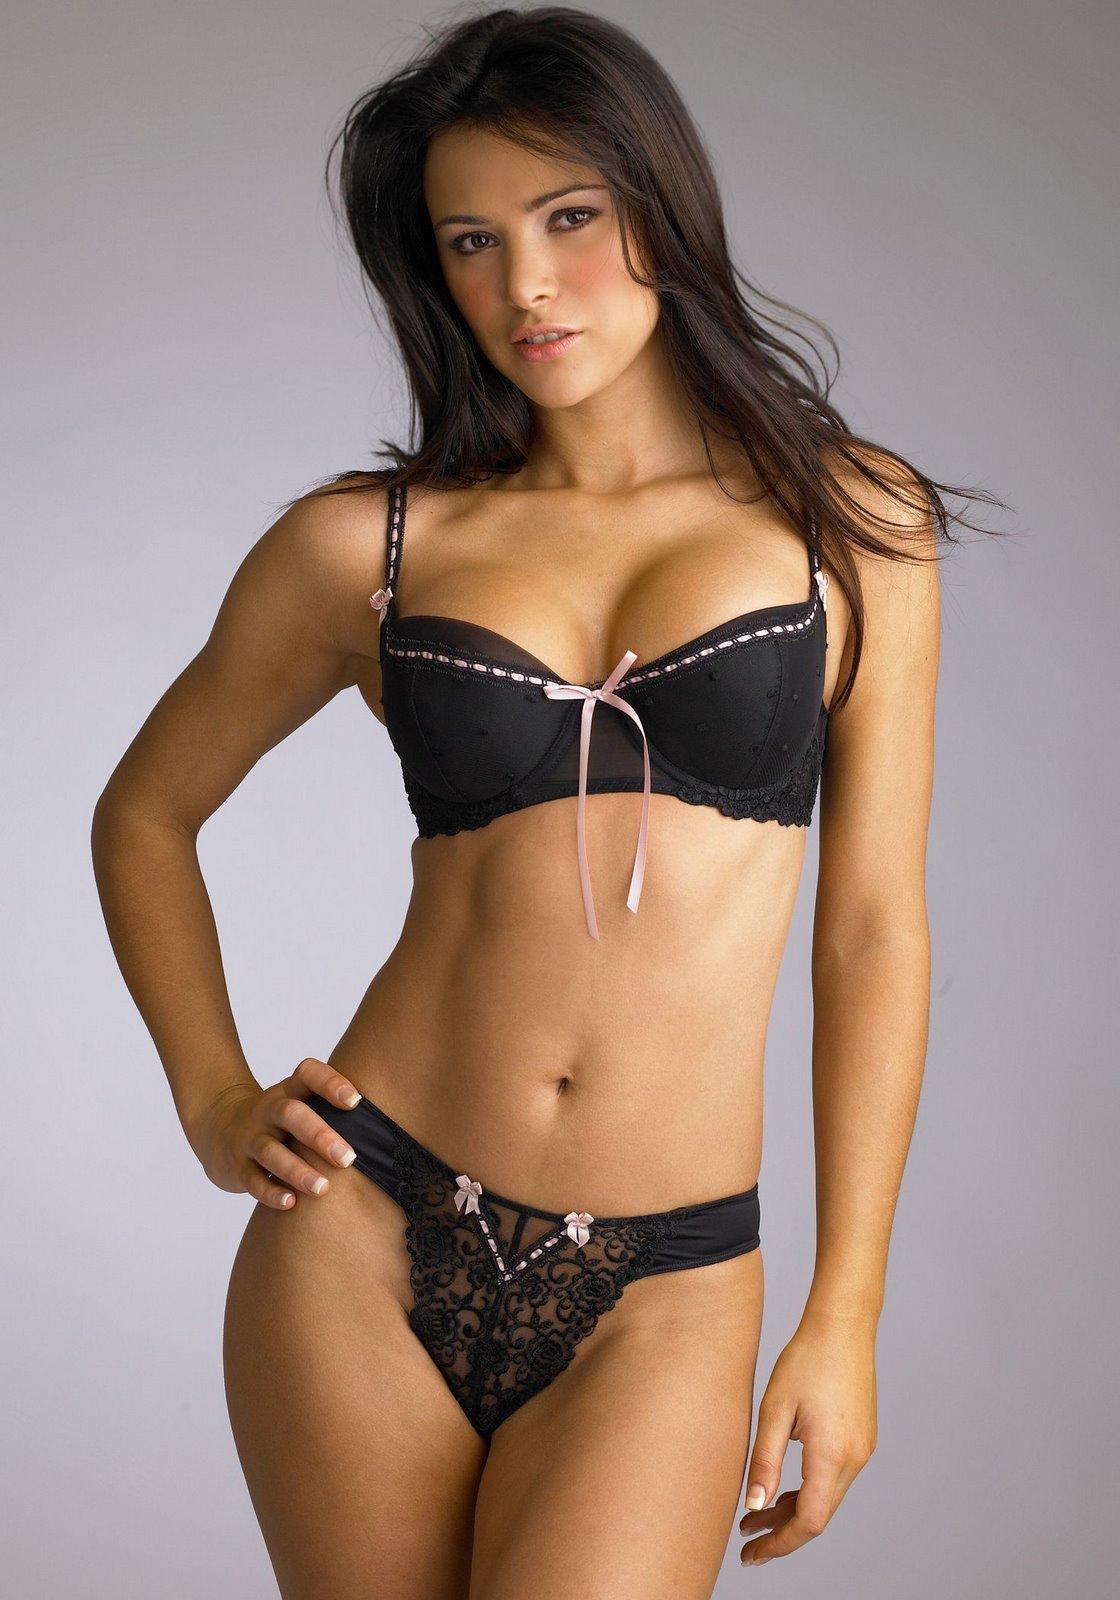 http://1.bp.blogspot.com/_MZeh3uFaOnI/TB86_E23SnI/AAAAAAAAIdo/nmXz8JB9TyA/s1600/20070312-alina.vacariu.hq.02.jpg